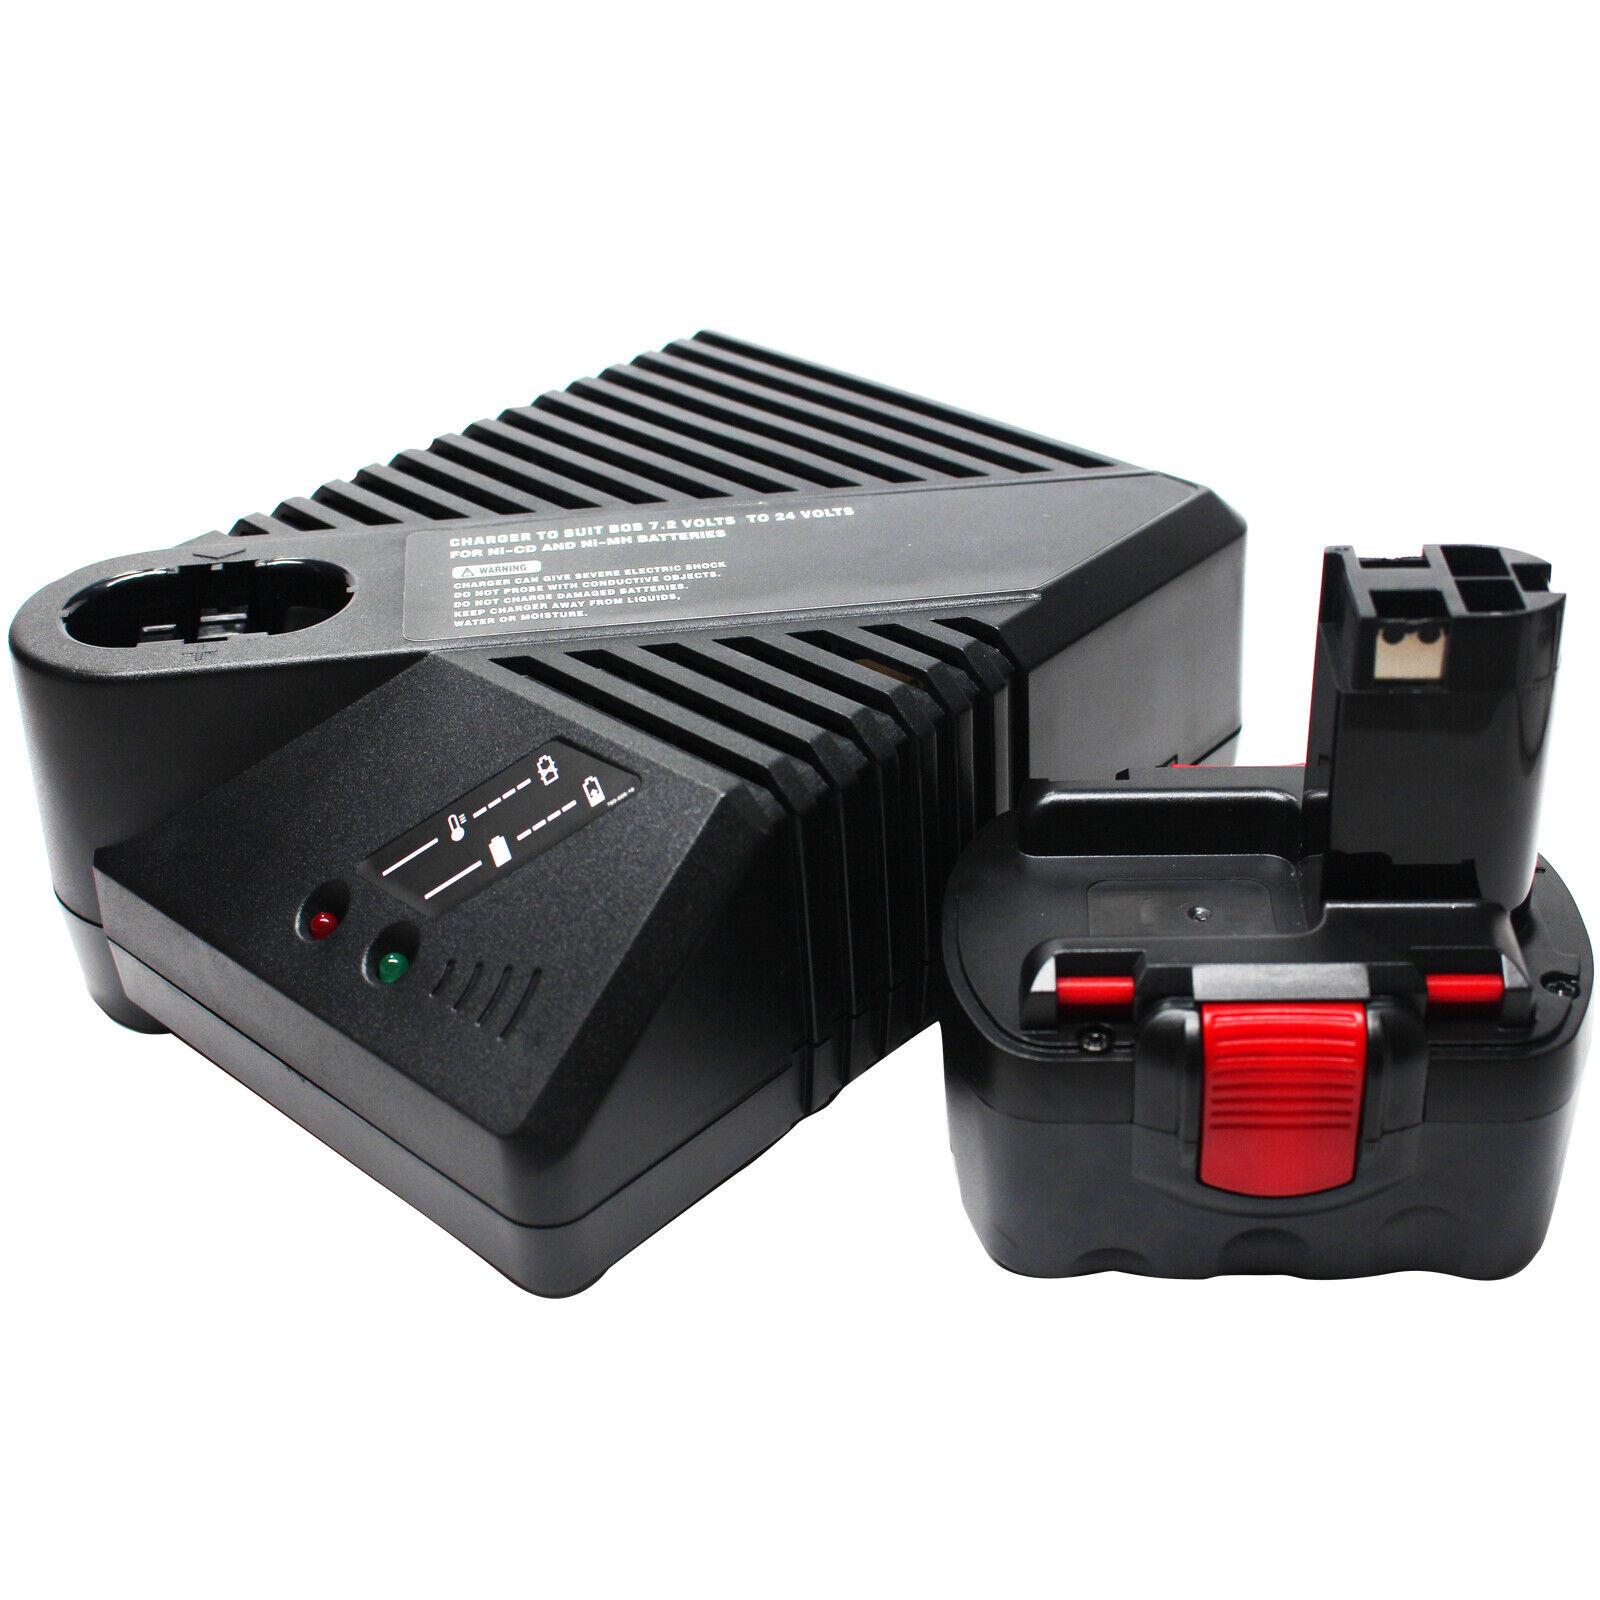 14.4V Battery 1.3Ah & UniCharger for Bosch 33614, 52314, GDS 14.4 V, 35614